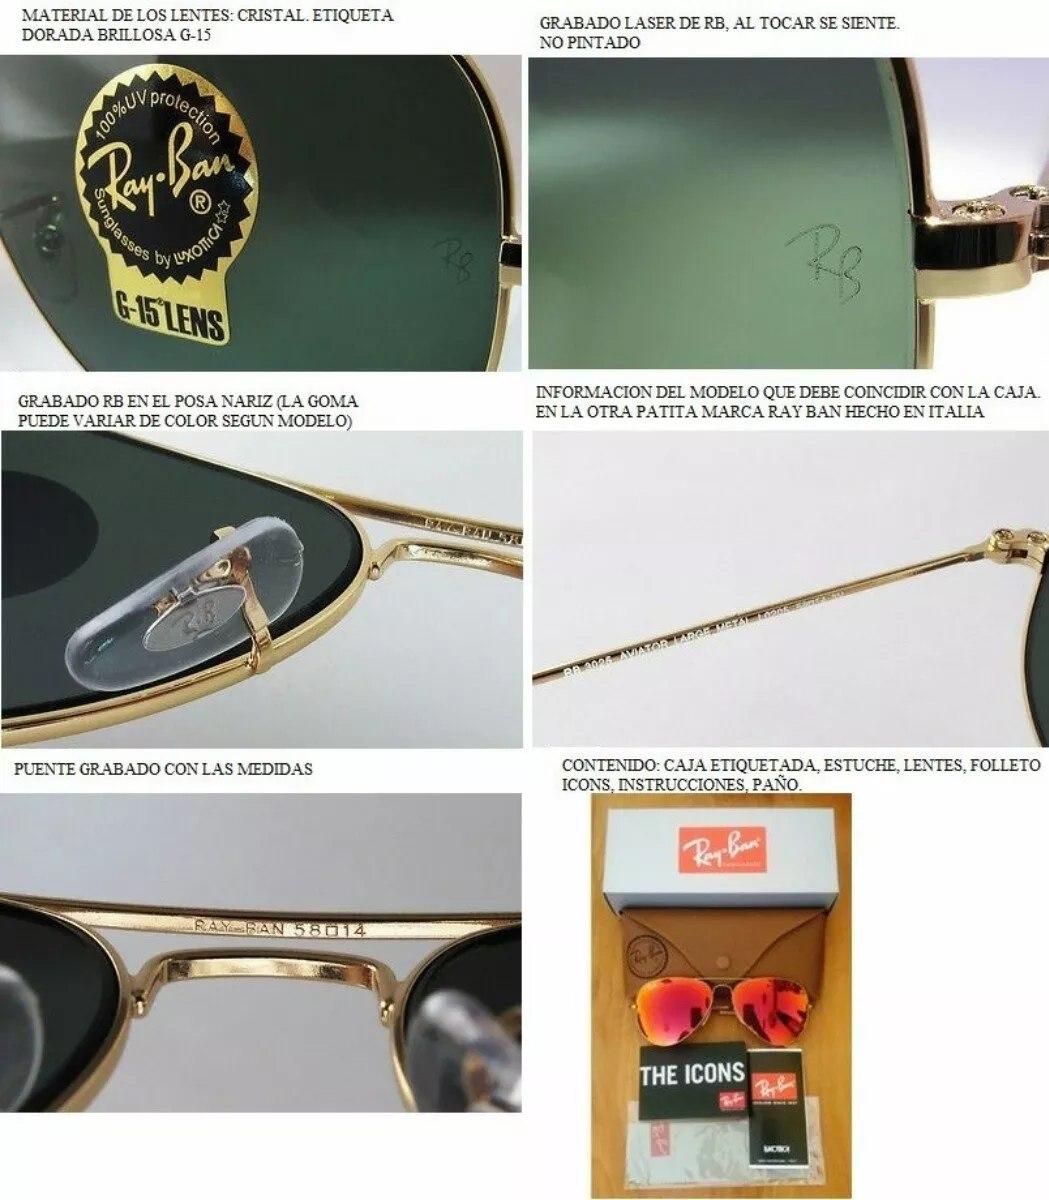 gafas ray ban aviator modelo 3025